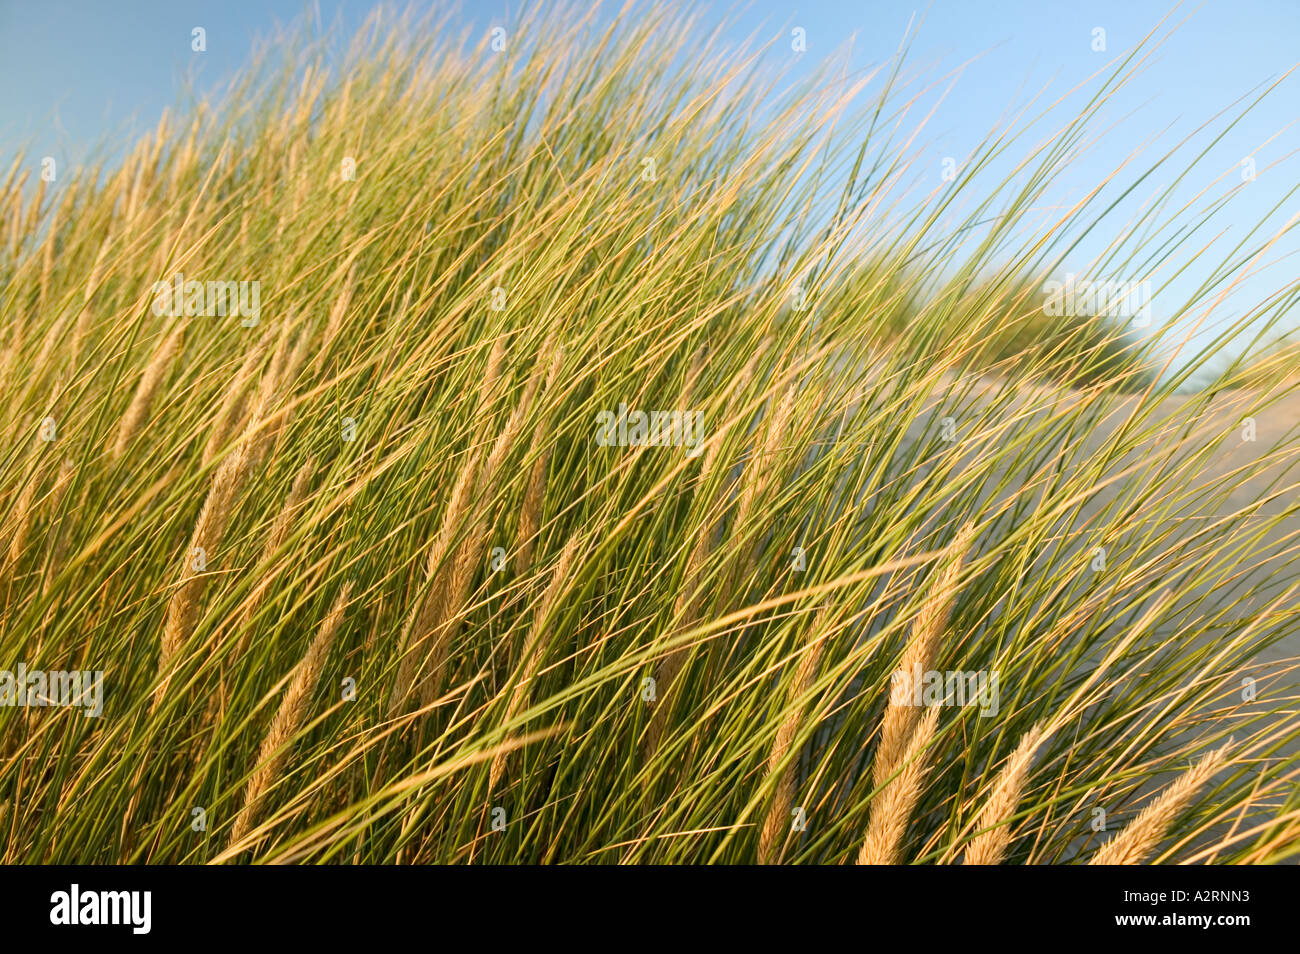 Maram Grass Dunes Twyni bach Borth Ceredigion Wales - Stock Image